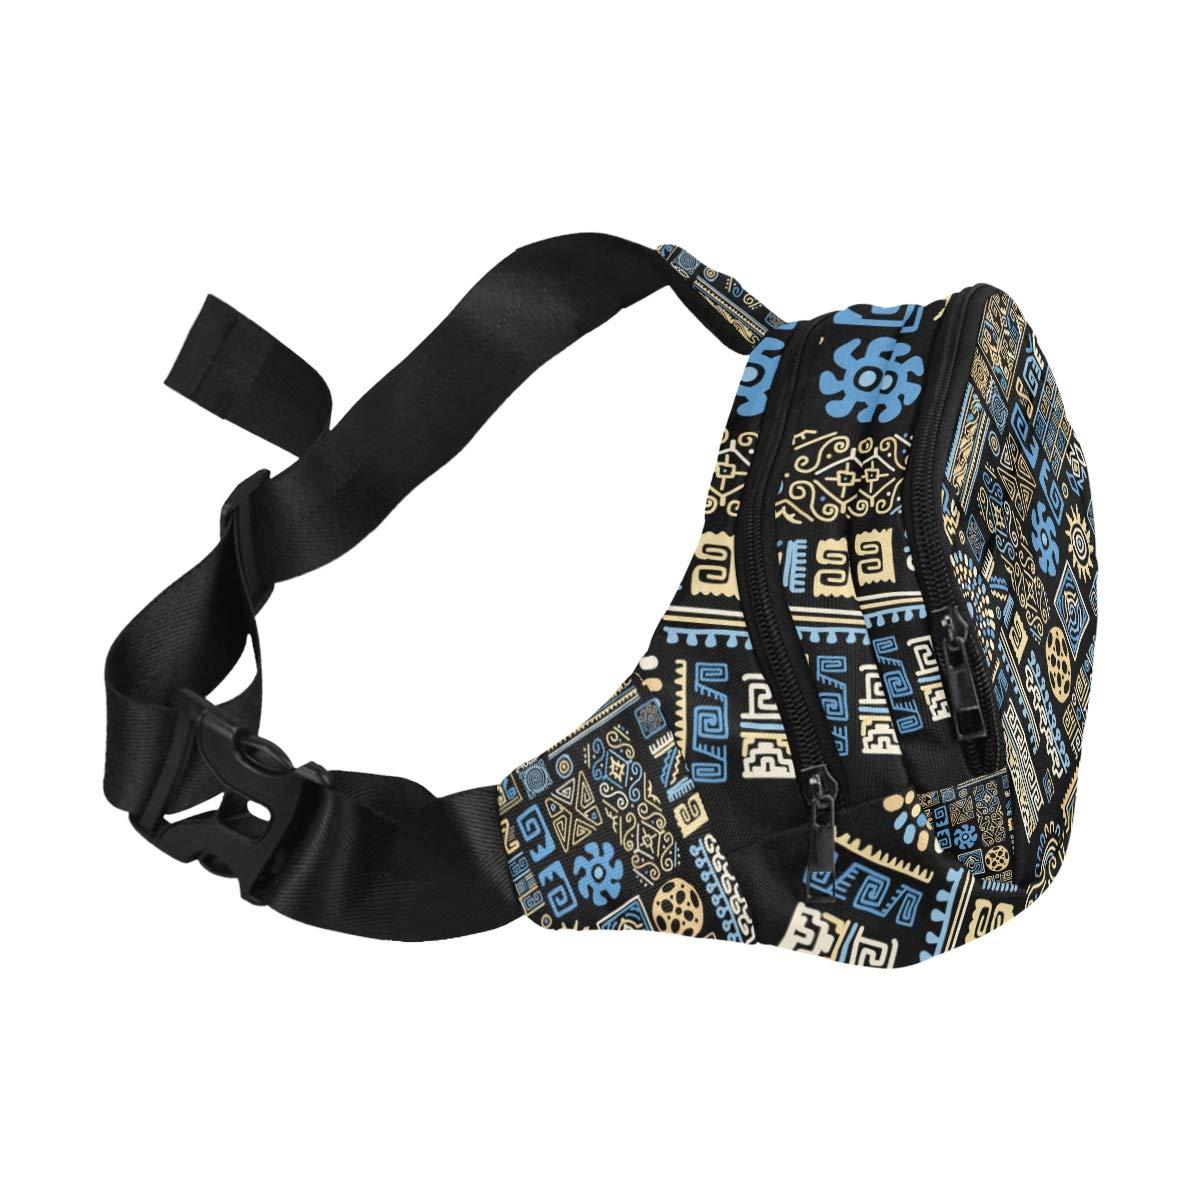 Beautiful Ethnic Decorative Lines Fenny Packs Waist Bags Adjustable Belt Waterproof Nylon Travel Running Sport Vacation Party For Men Women Boys Girls Kids